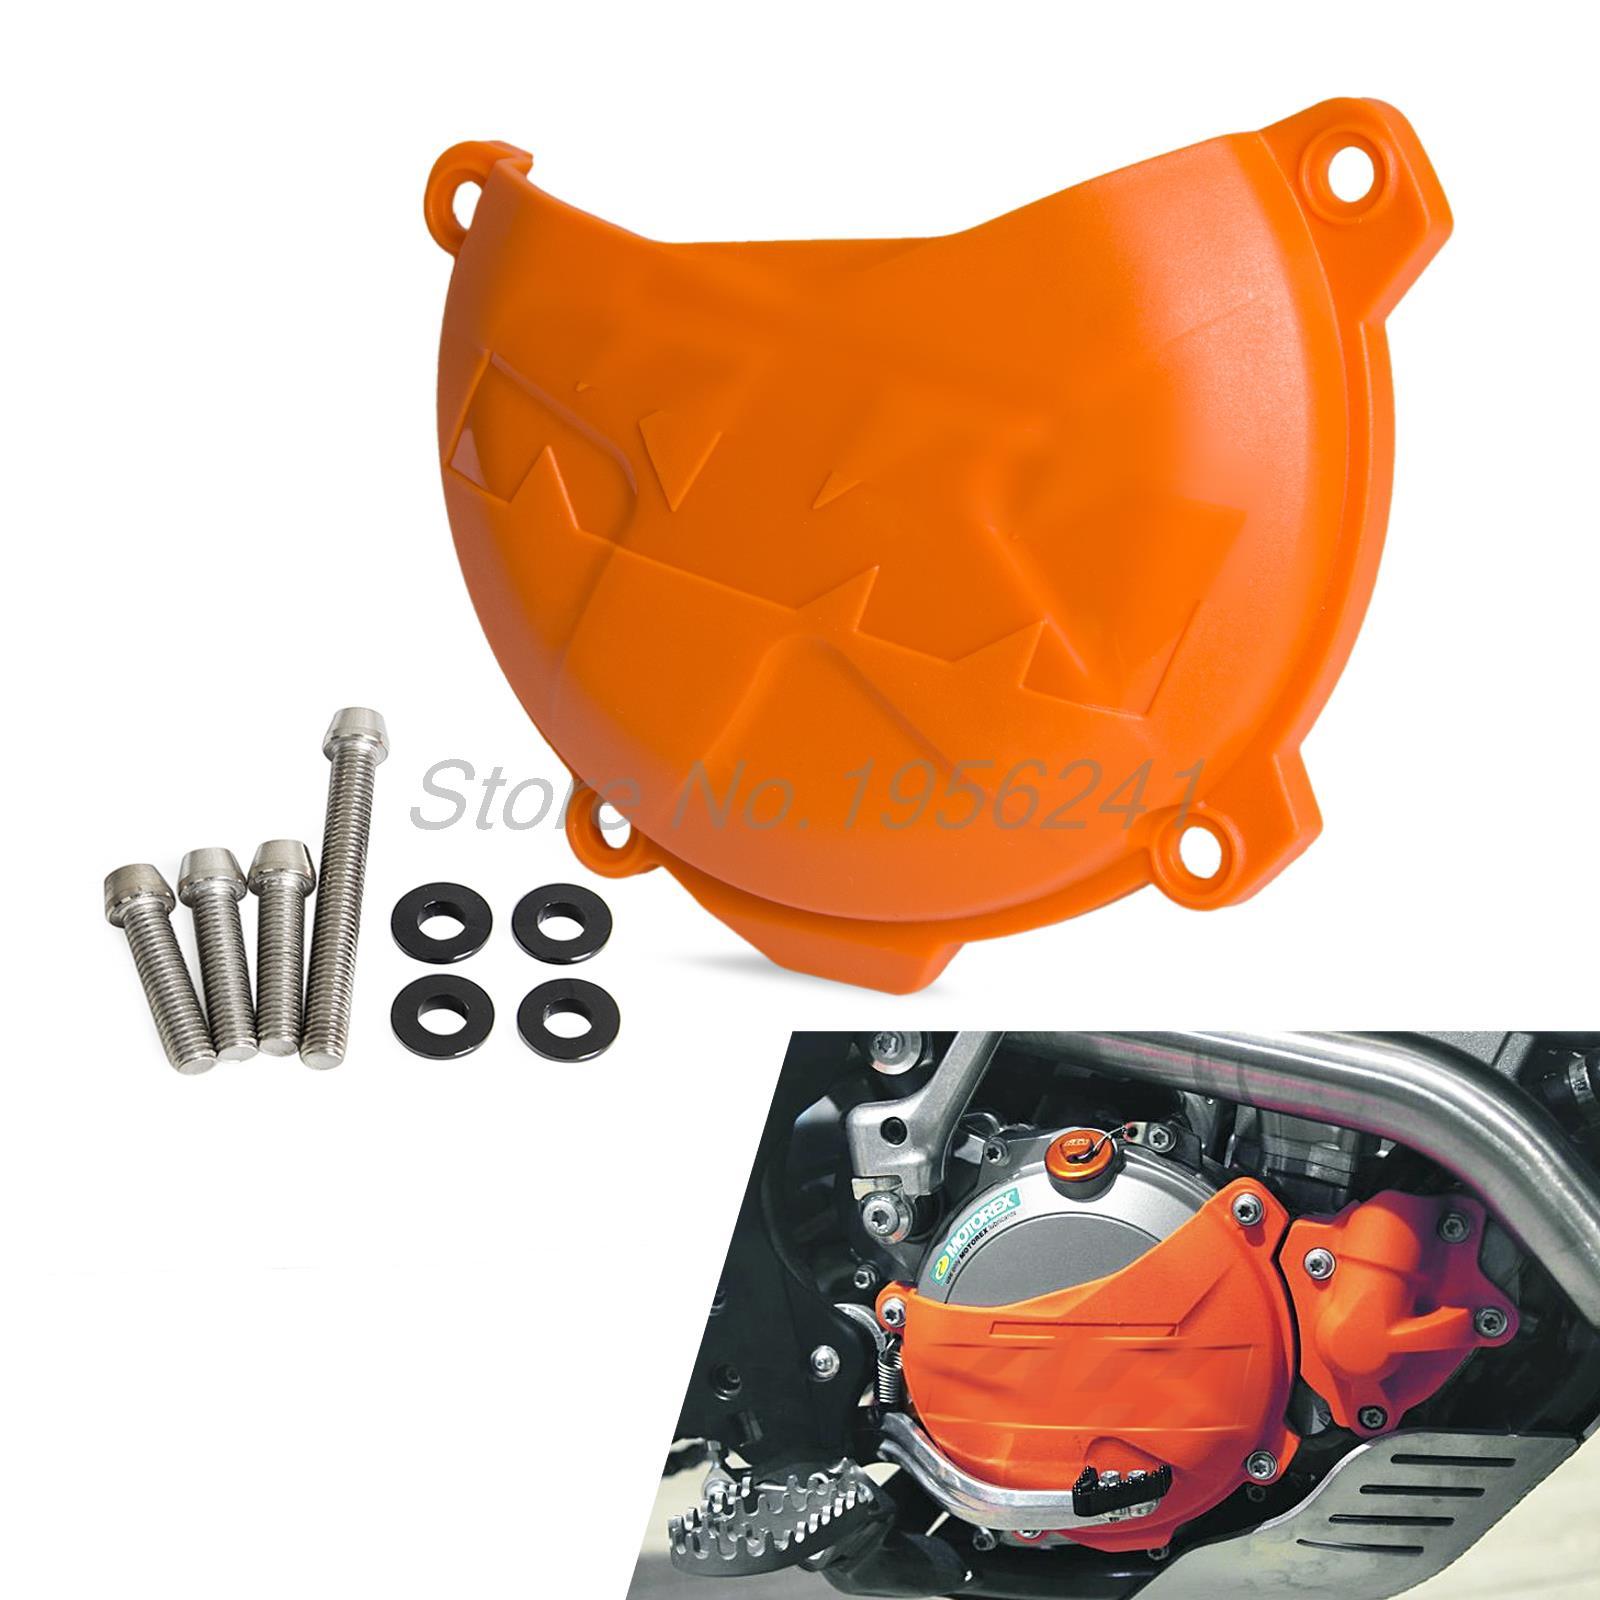 Clutch Cover Protection Cover for KTM 250 XCF-W 350 XCF-W FREERIDE 350 2012-2017 clutch adriana muti clutch